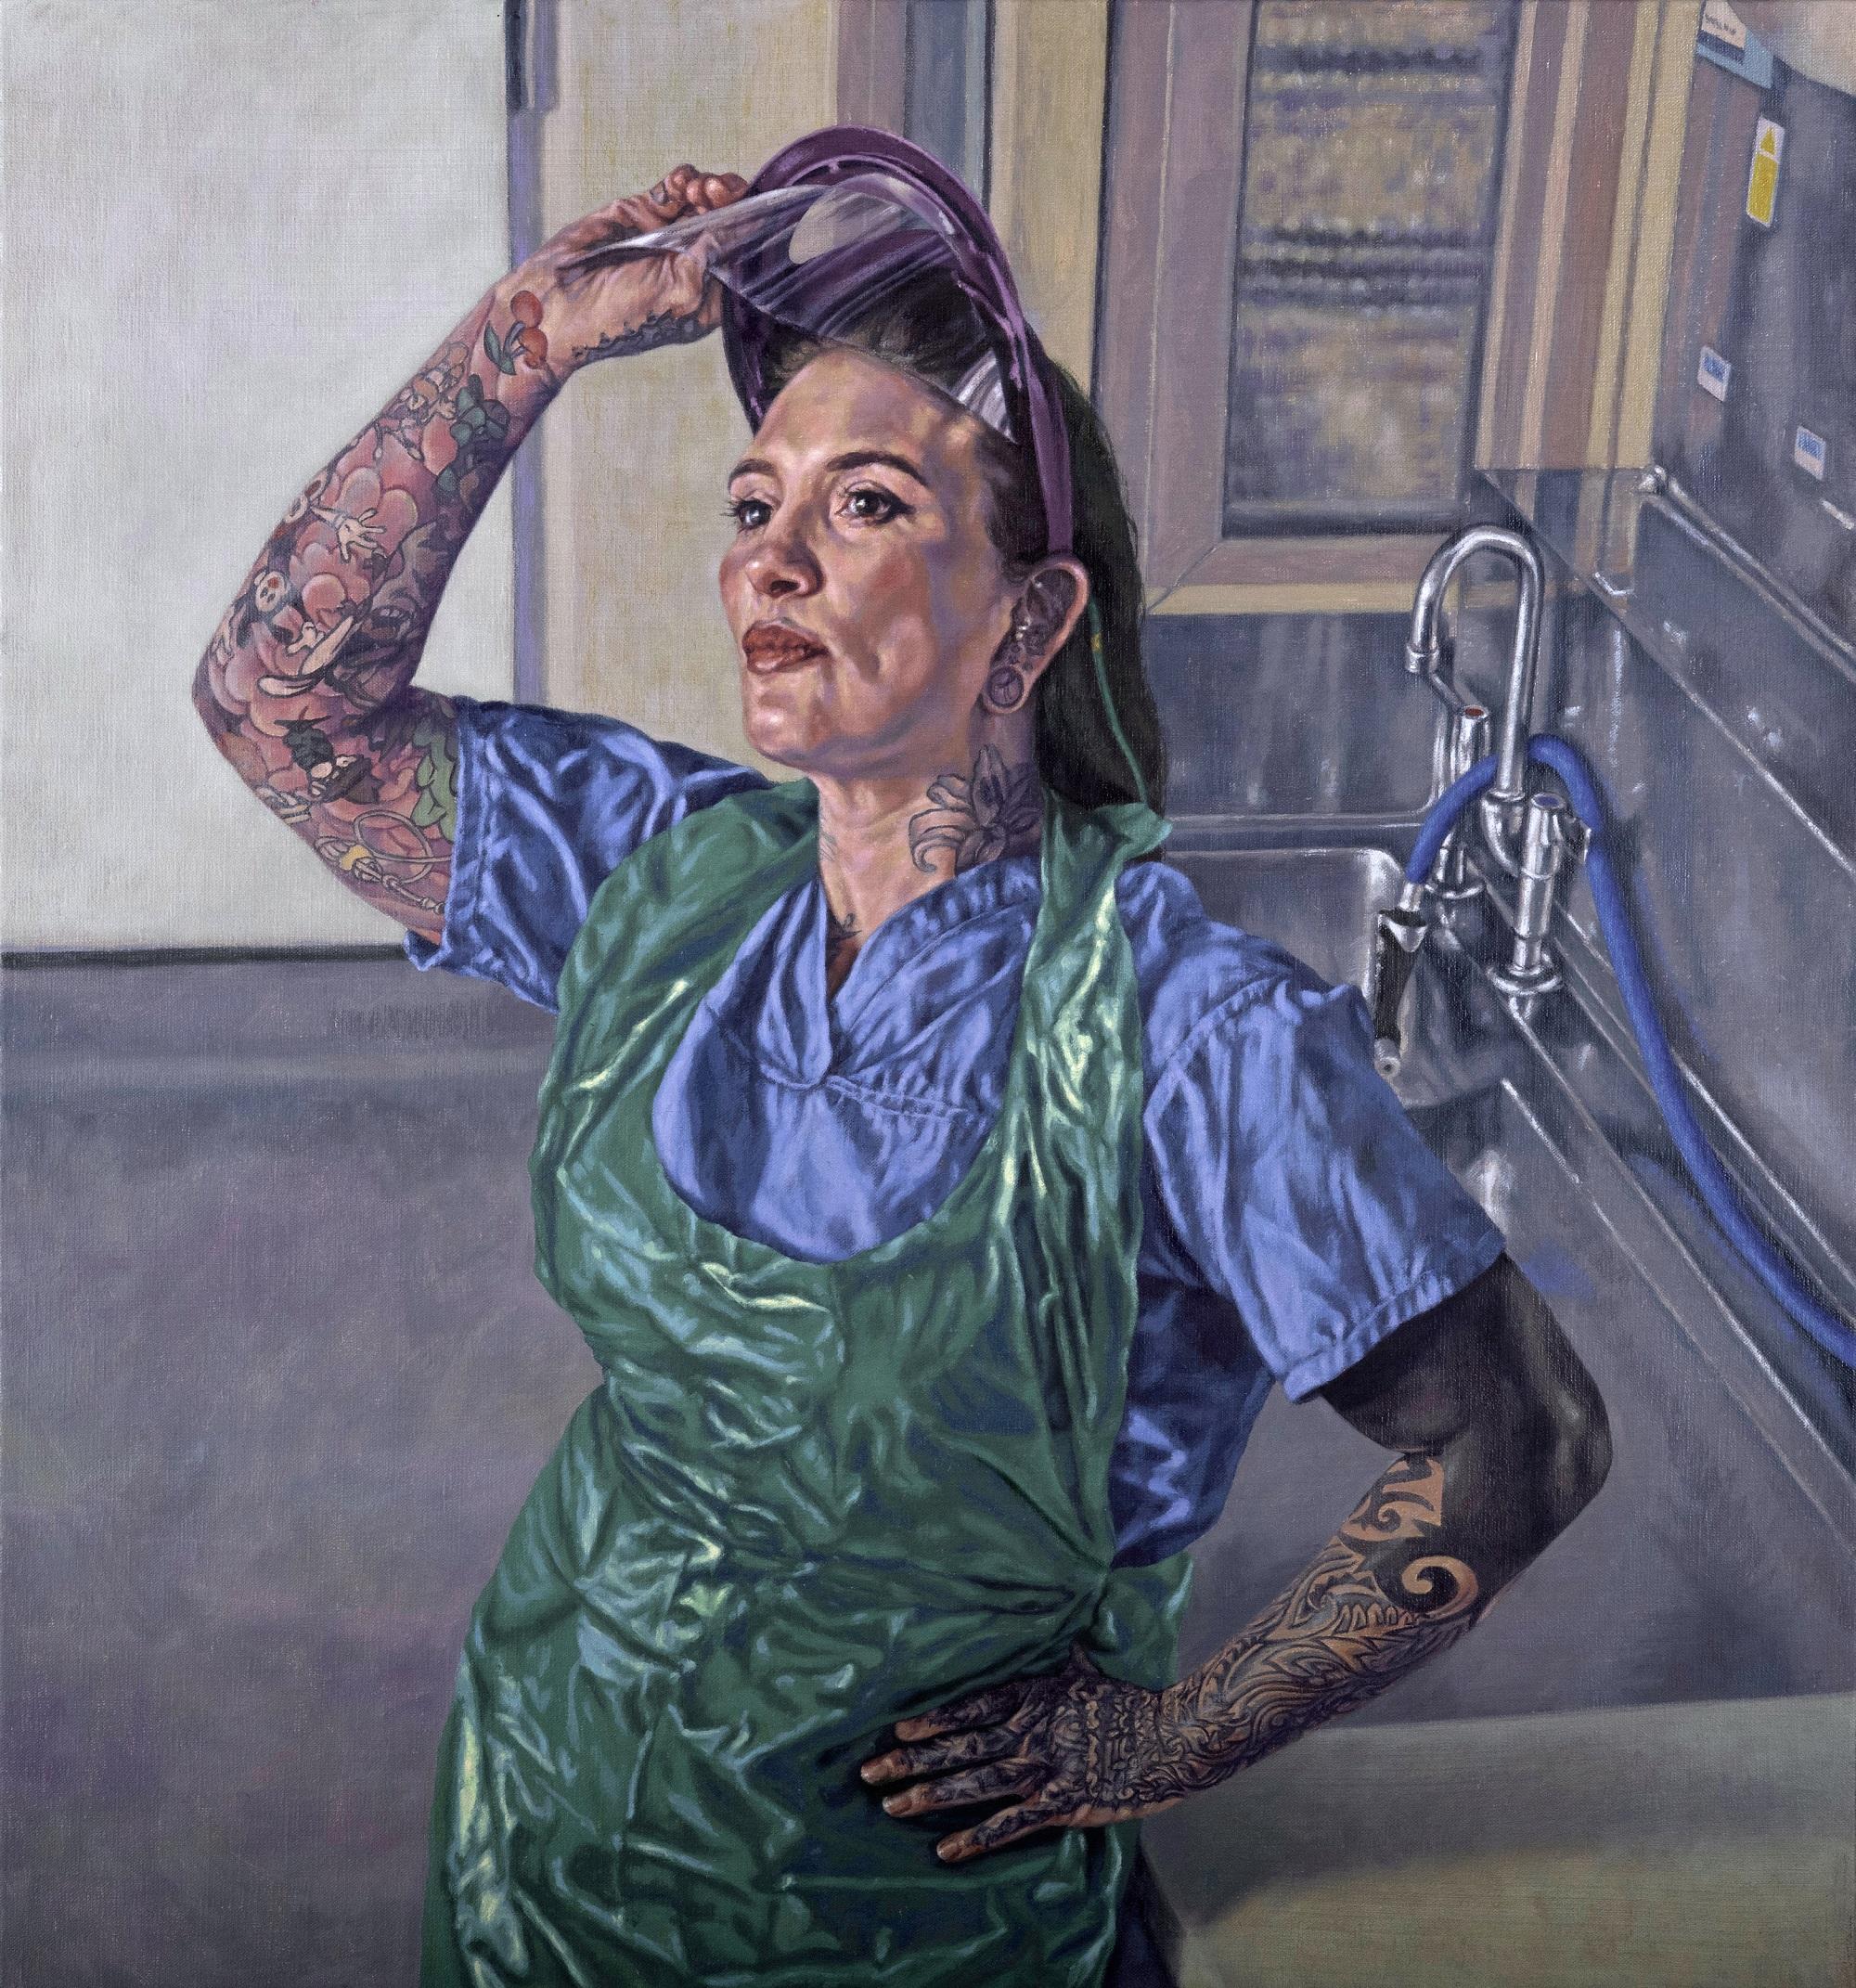 Katie Tomkins - Mortuary & Post Mortem Services Manager at West Hertfordshire NHS Trust, Roxana Halls Oil on linen, 75 x 70cm